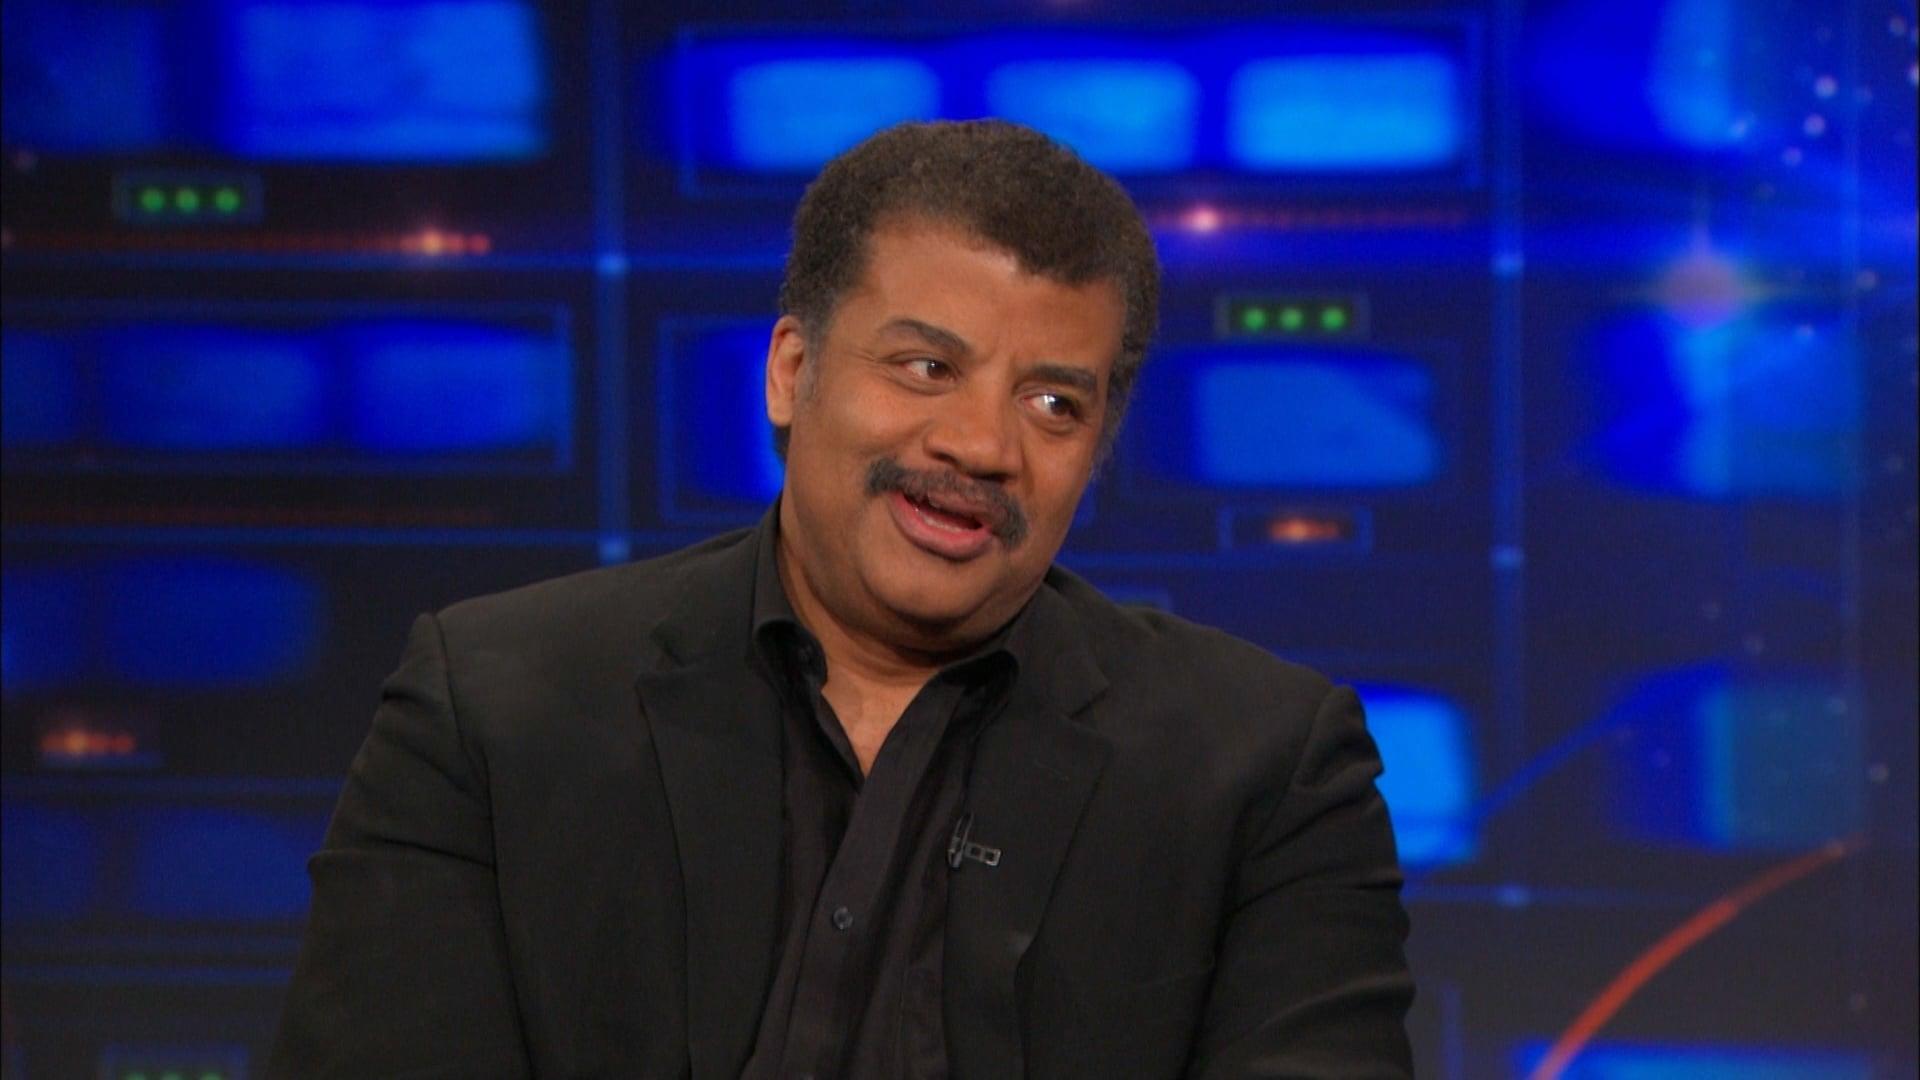 The Daily Show with Trevor Noah Season 20 :Episode 95  Neil deGrasse Tyson